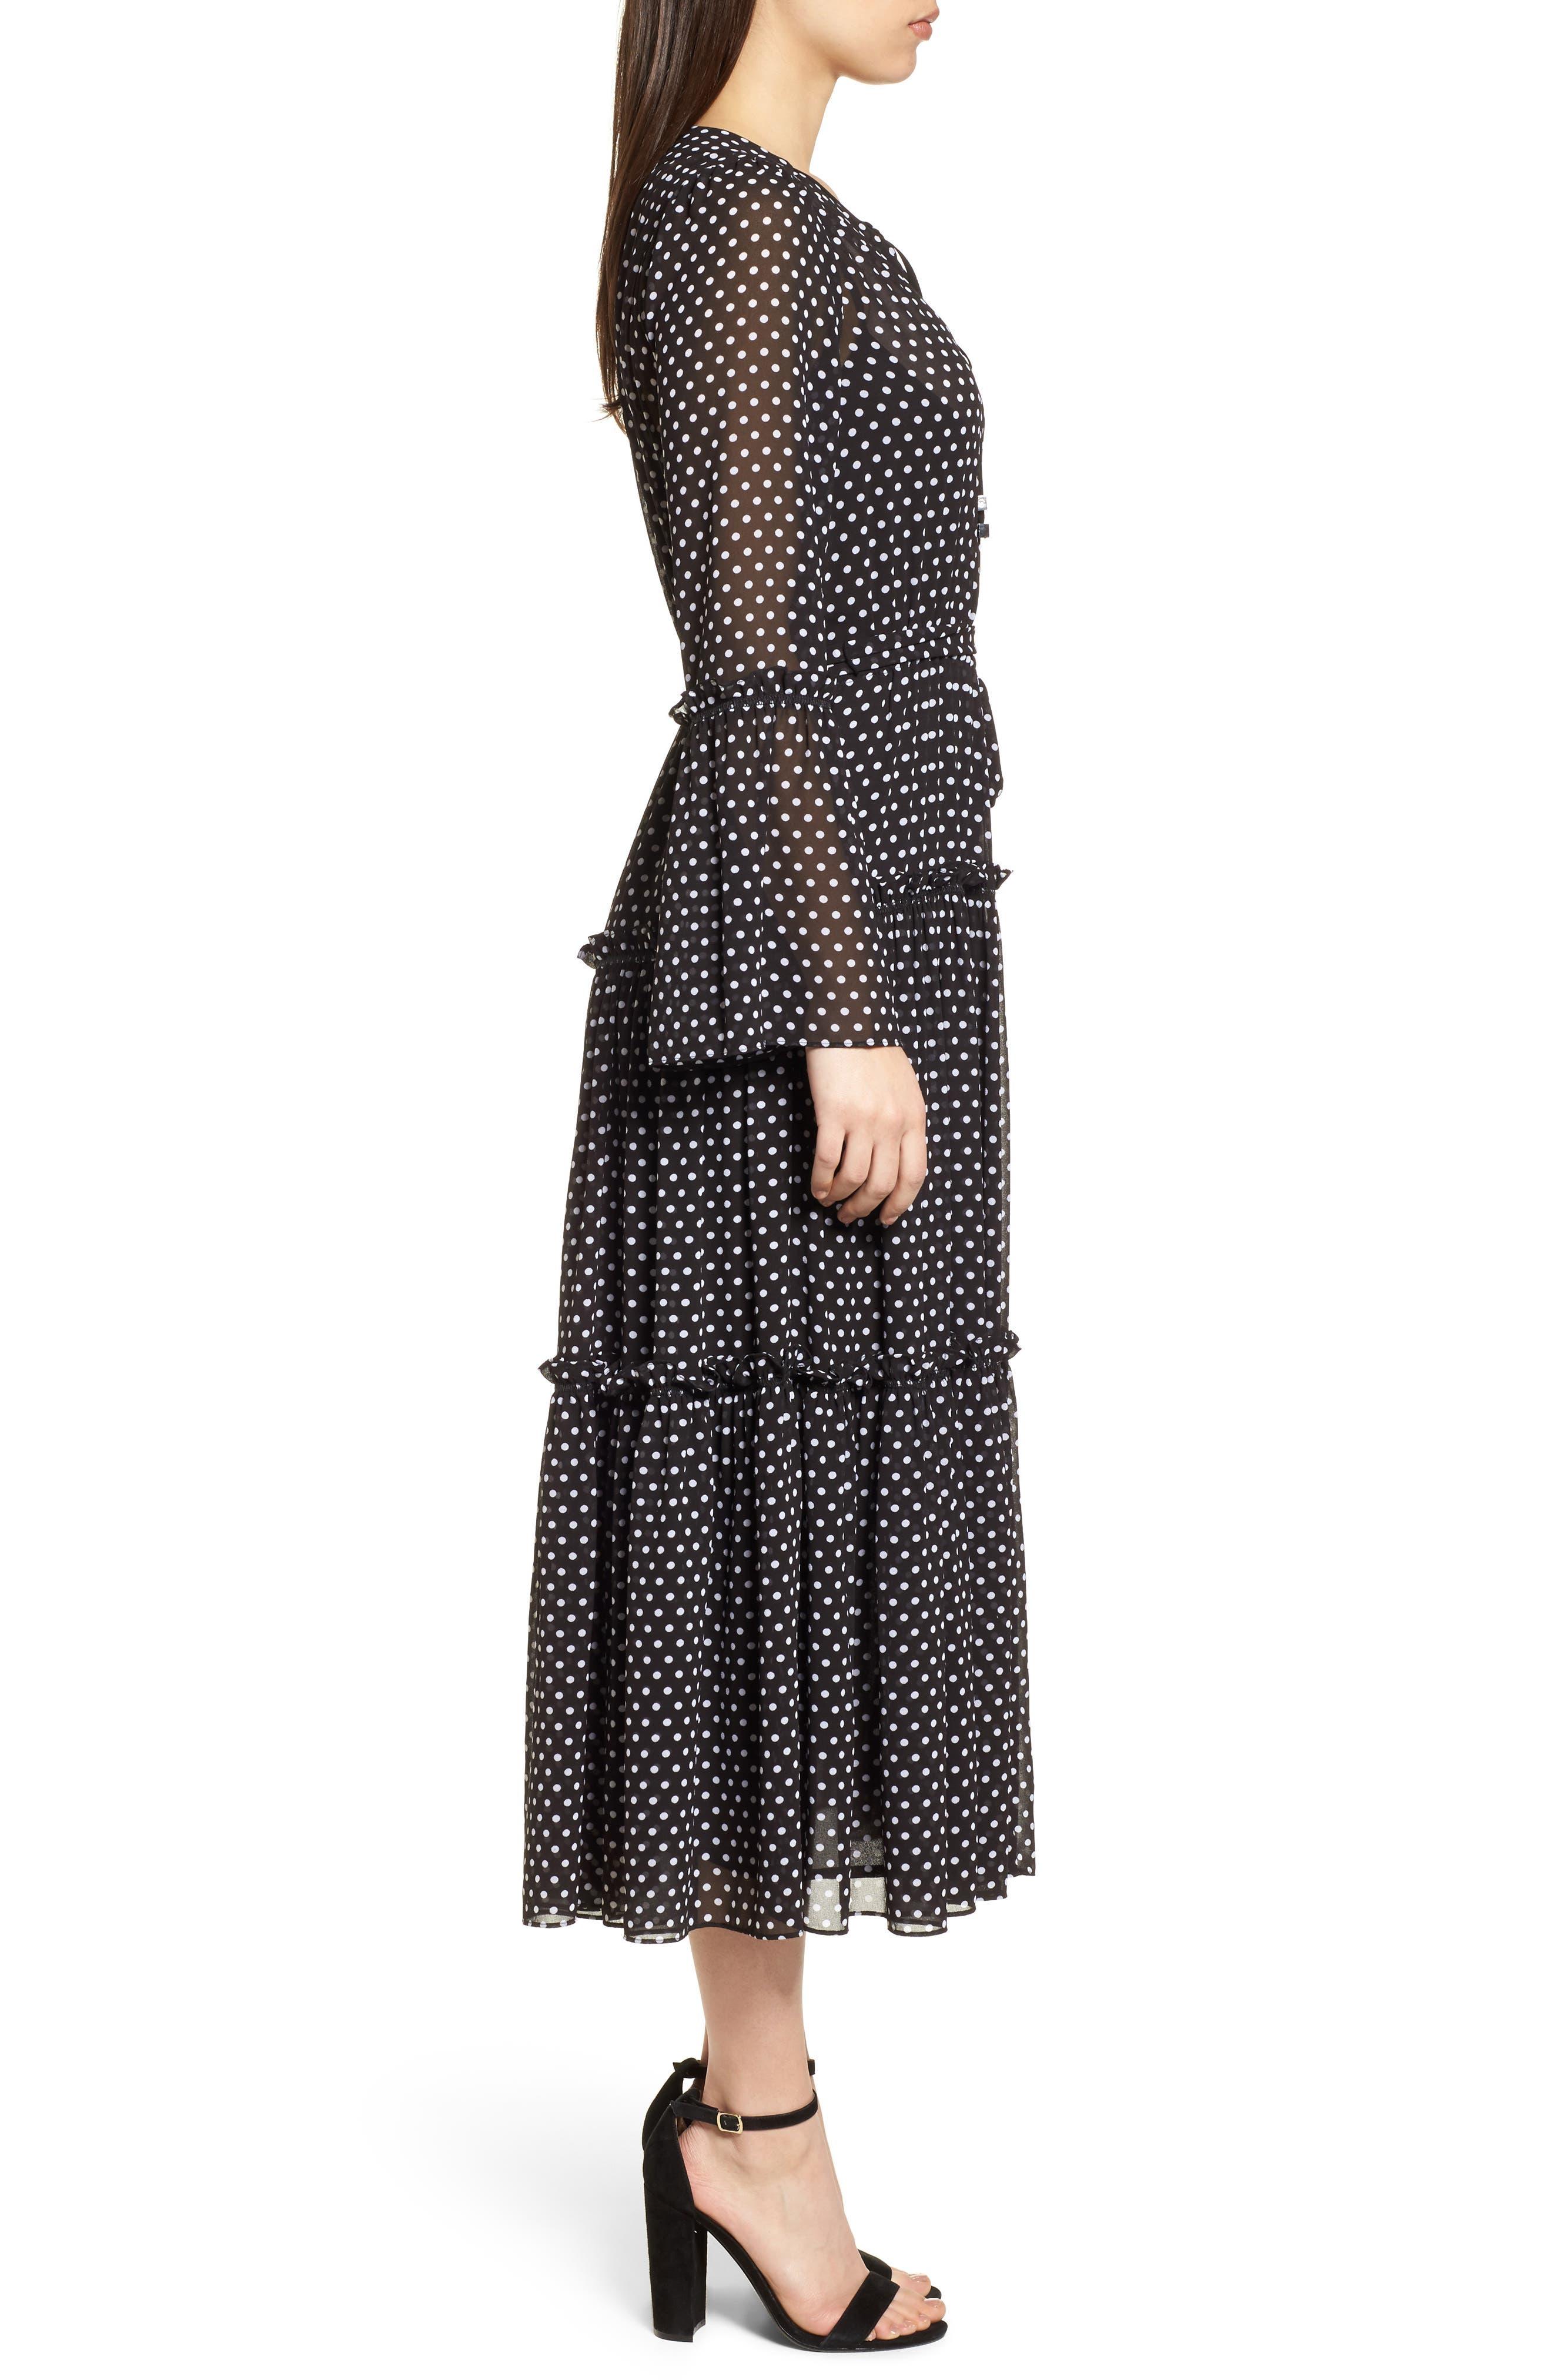 Tiered Dot Boho Dress,                             Alternate thumbnail 3, color,                             Black/ White